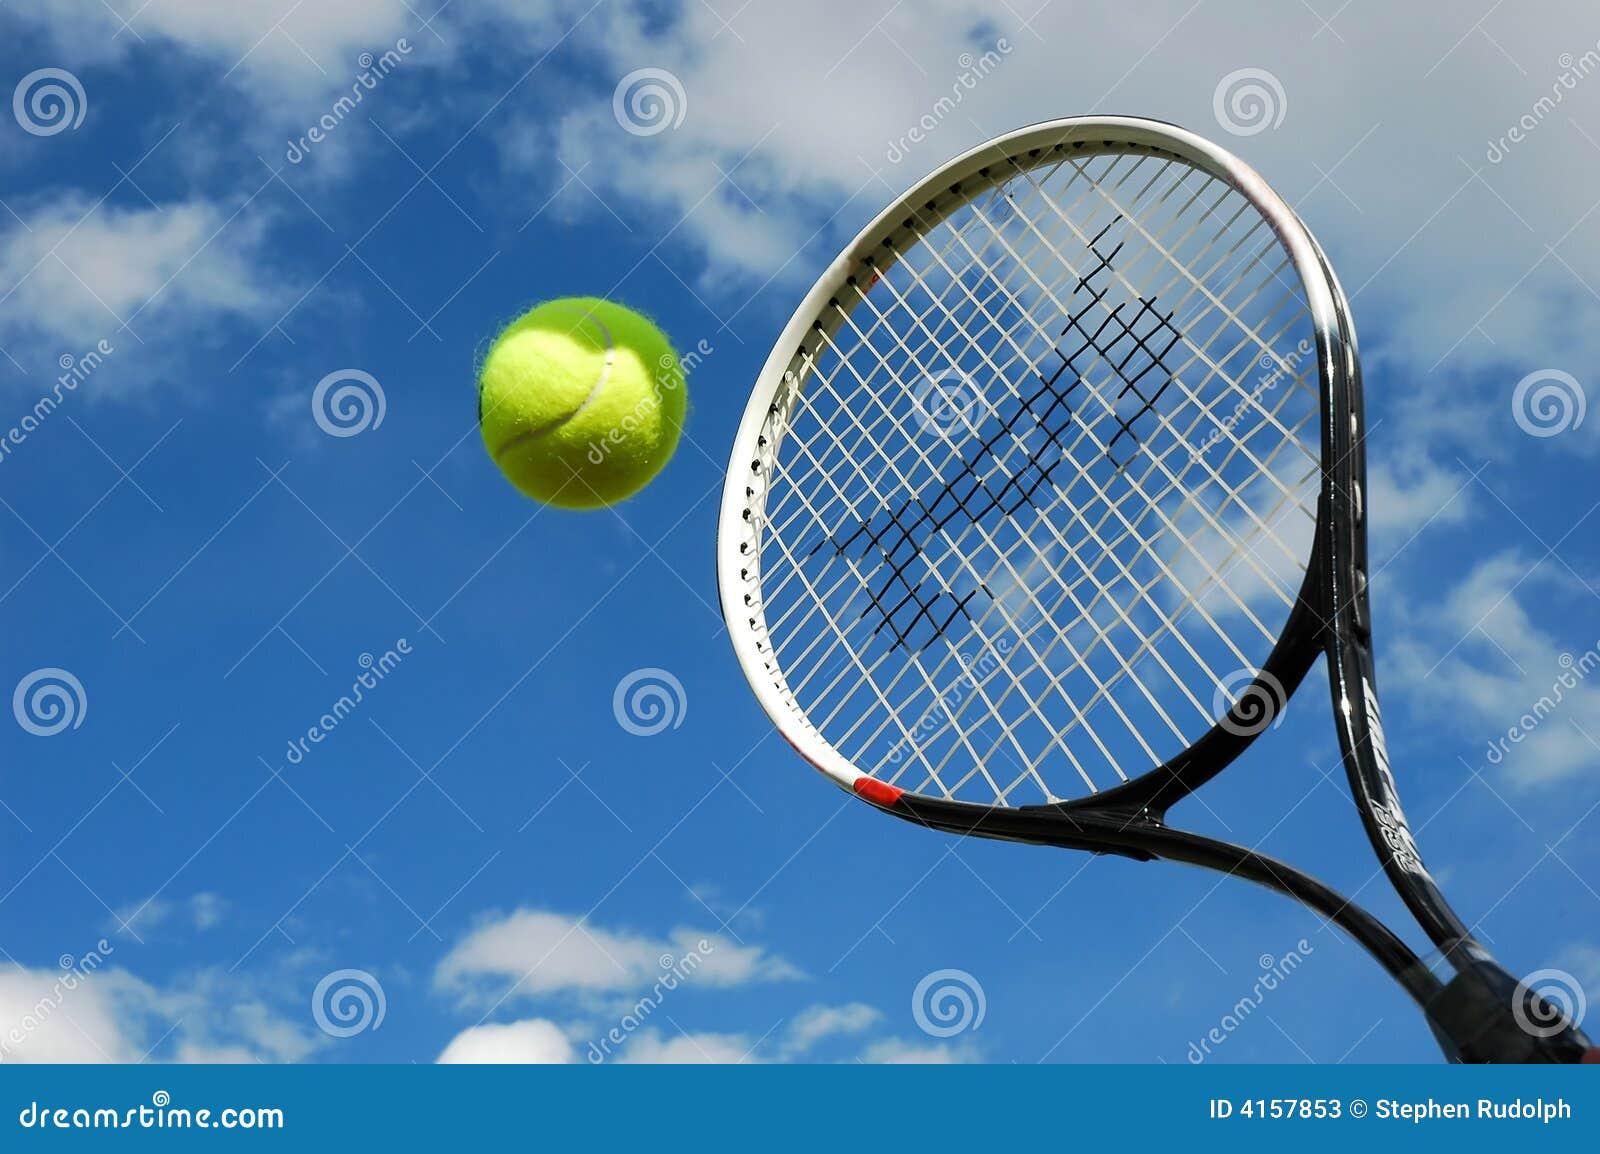 Tennis in action